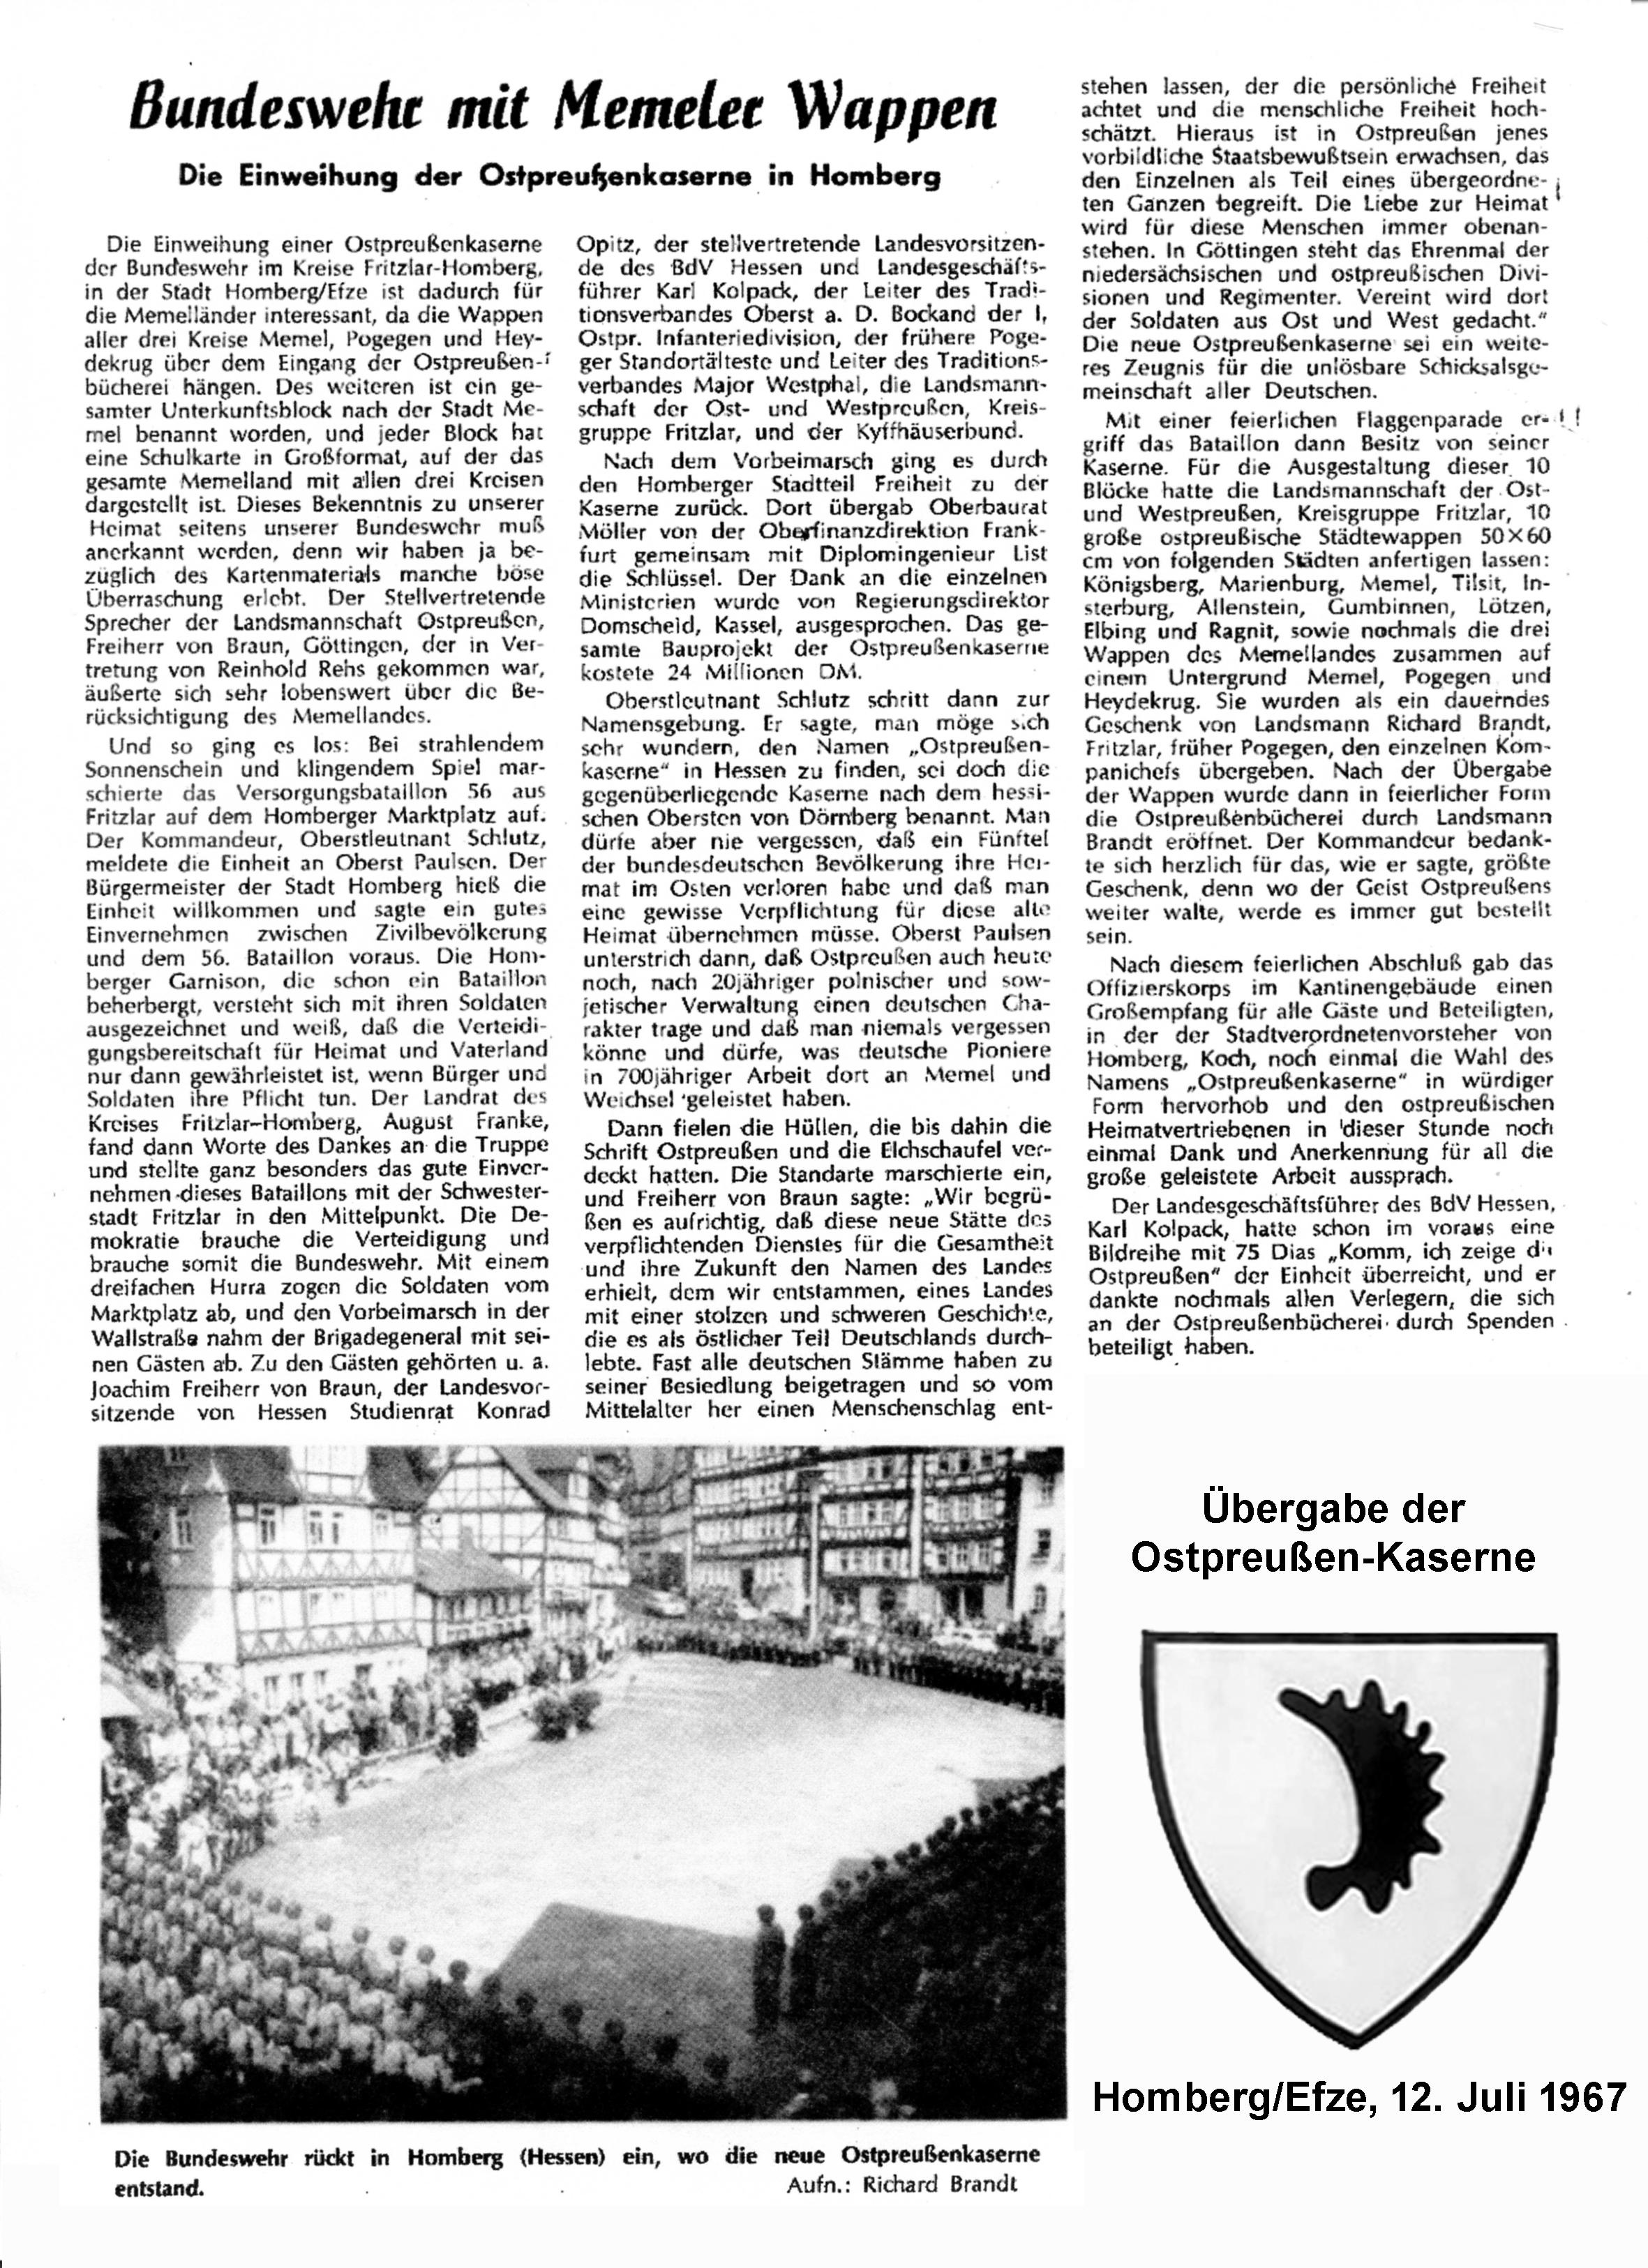 Übergabe Ostpreußen Kaserne 1967 a